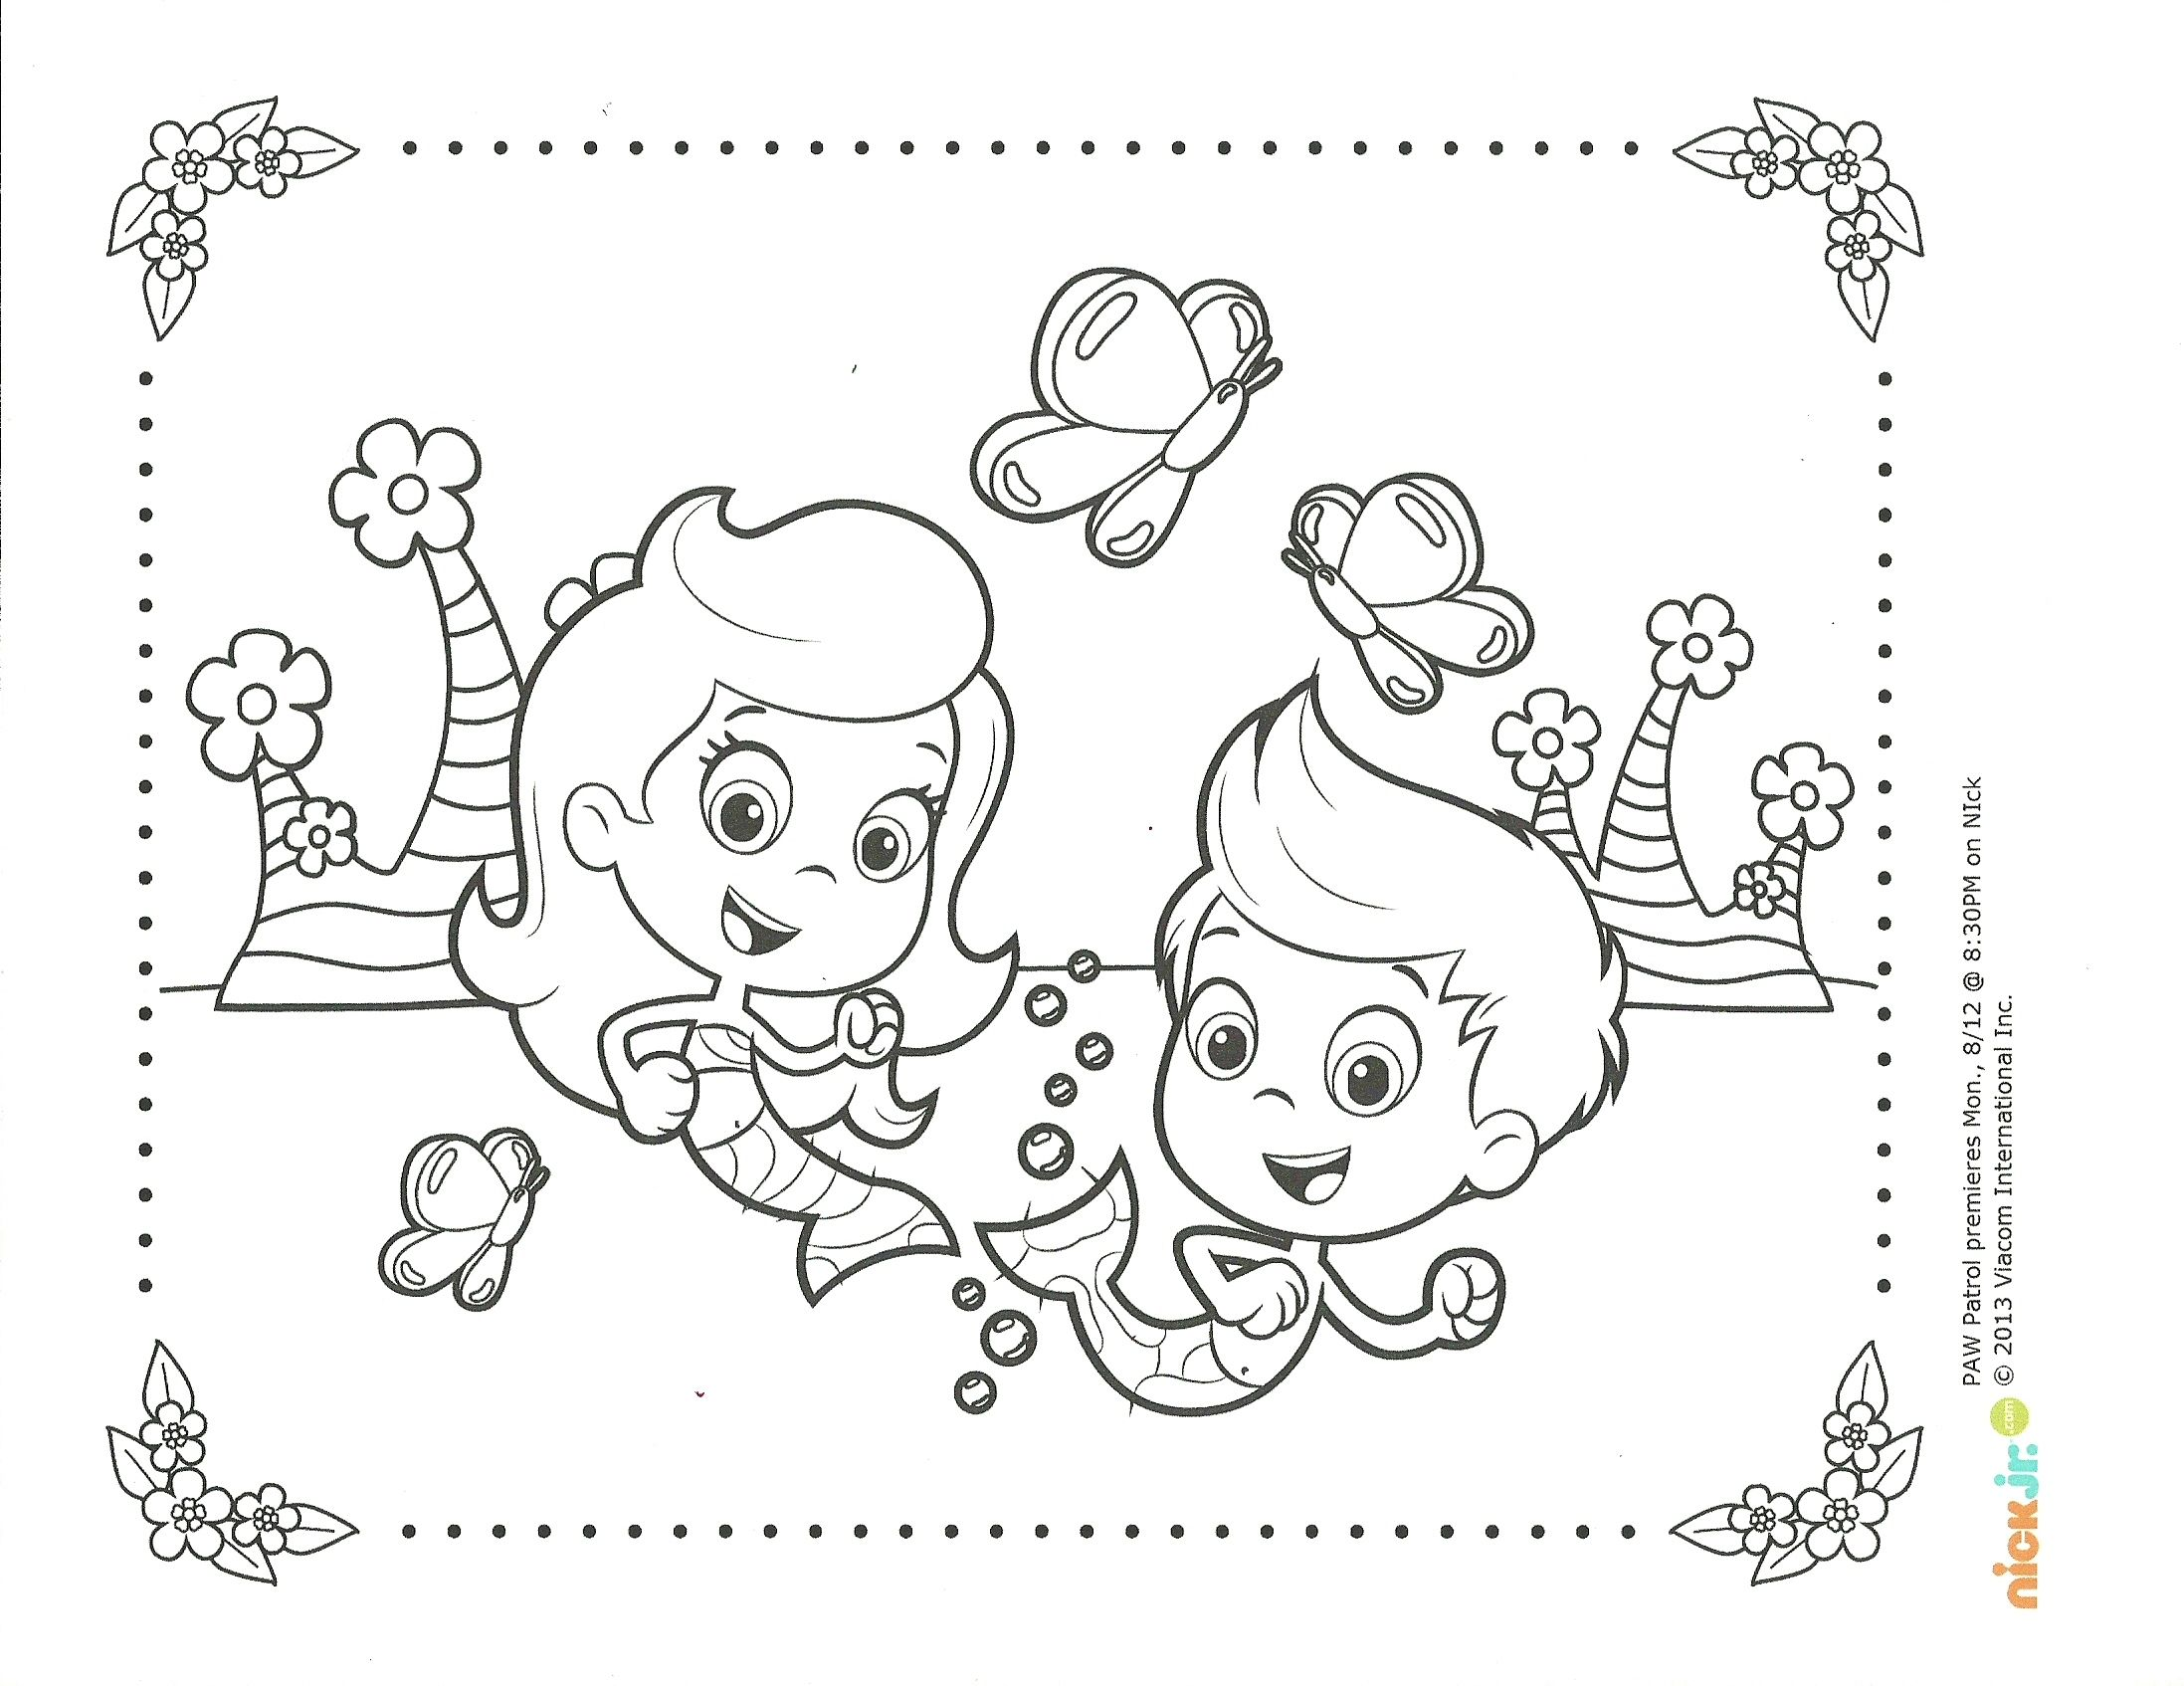 Bubble Guppies Springtime Coloring Page Bubble Guppies Coloring